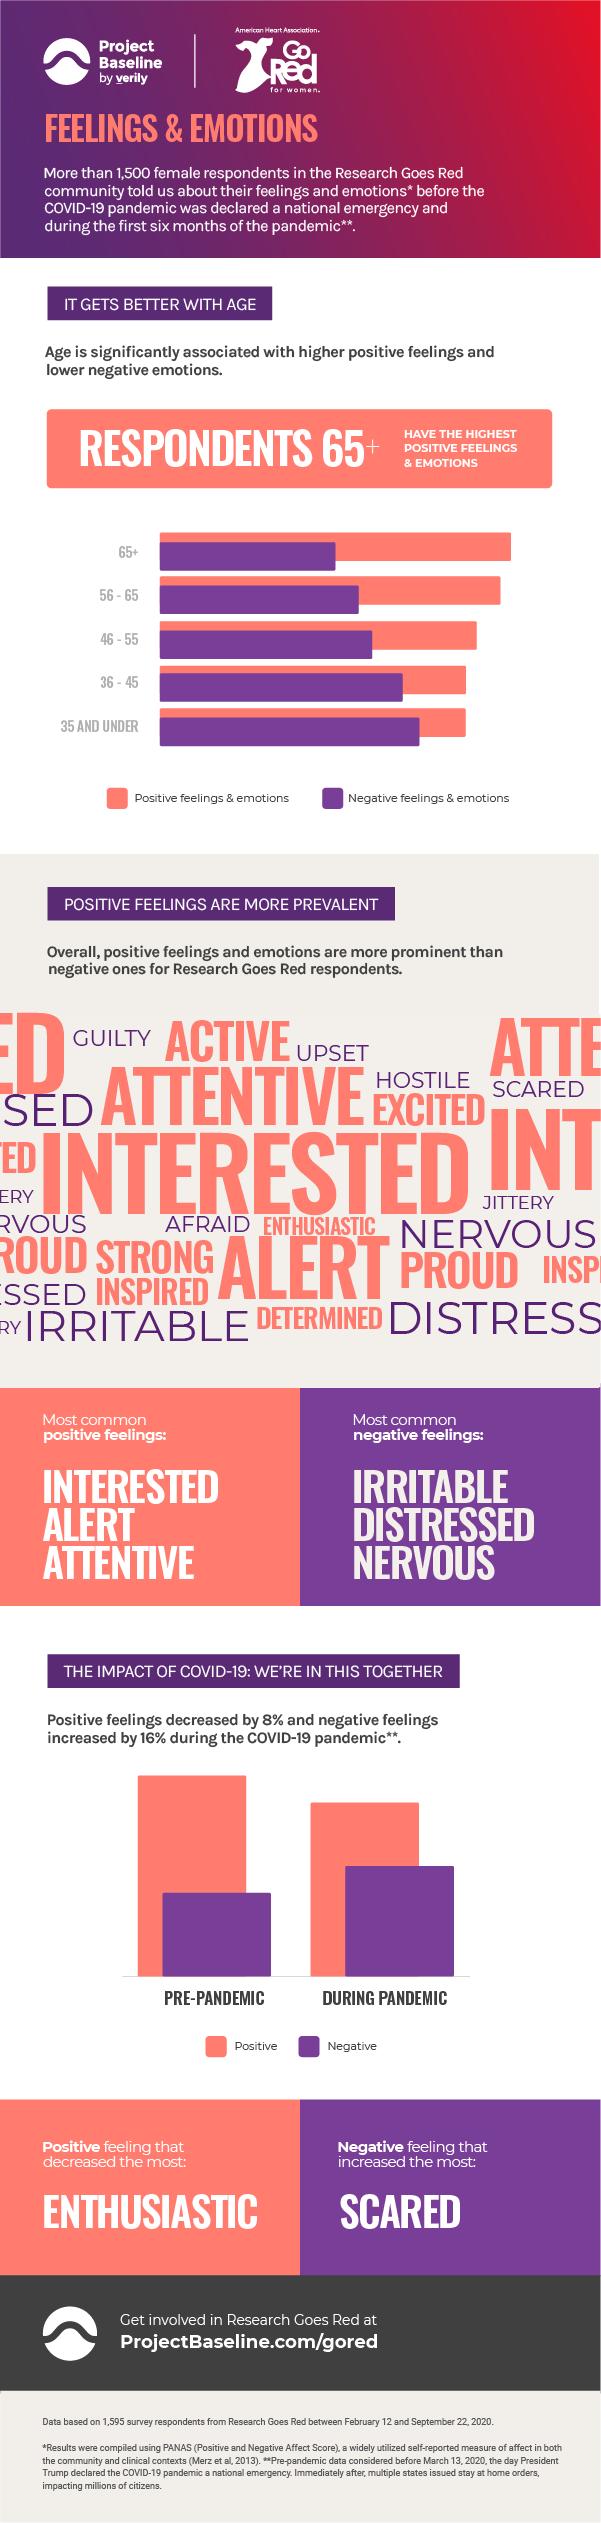 RGR feelings & emotions infographics